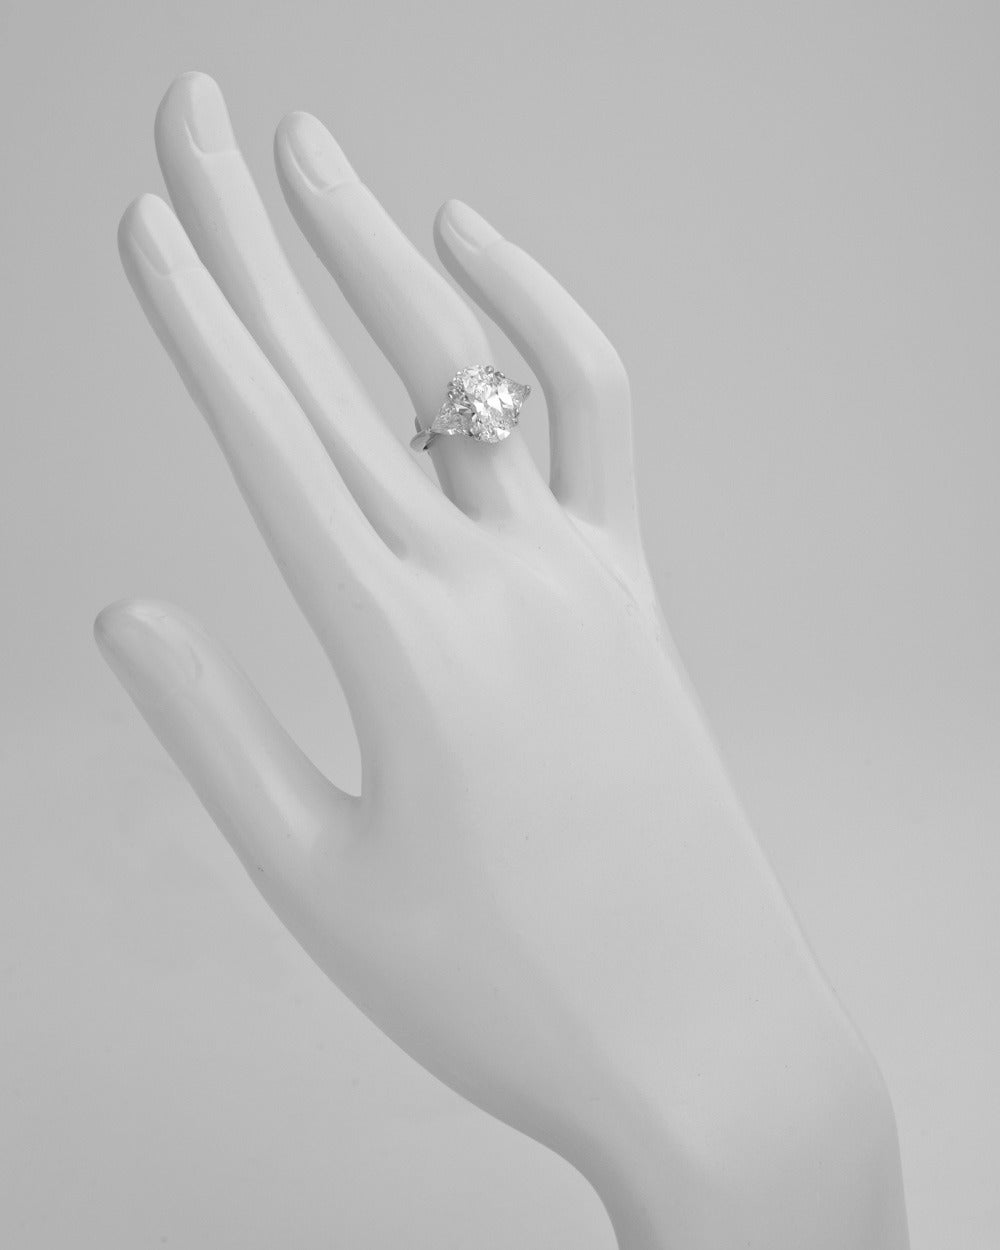 Tiffany & Co. 3.09 Carat Oval-Cut Diamond Engagement Ring 3